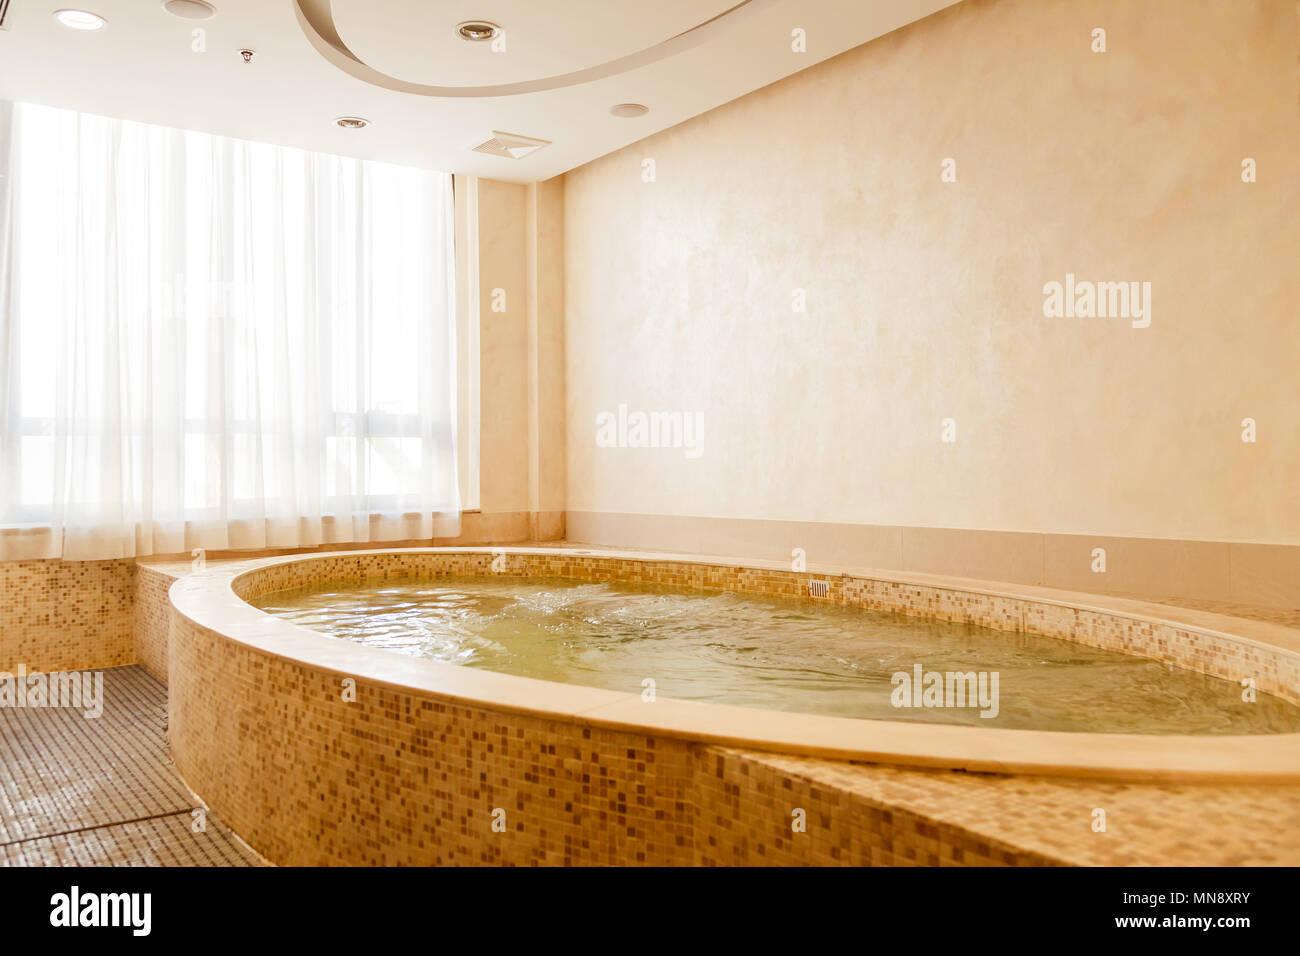 Jacuzzi baths in hotel spa center Stock Photo: 185208127 - Alamy